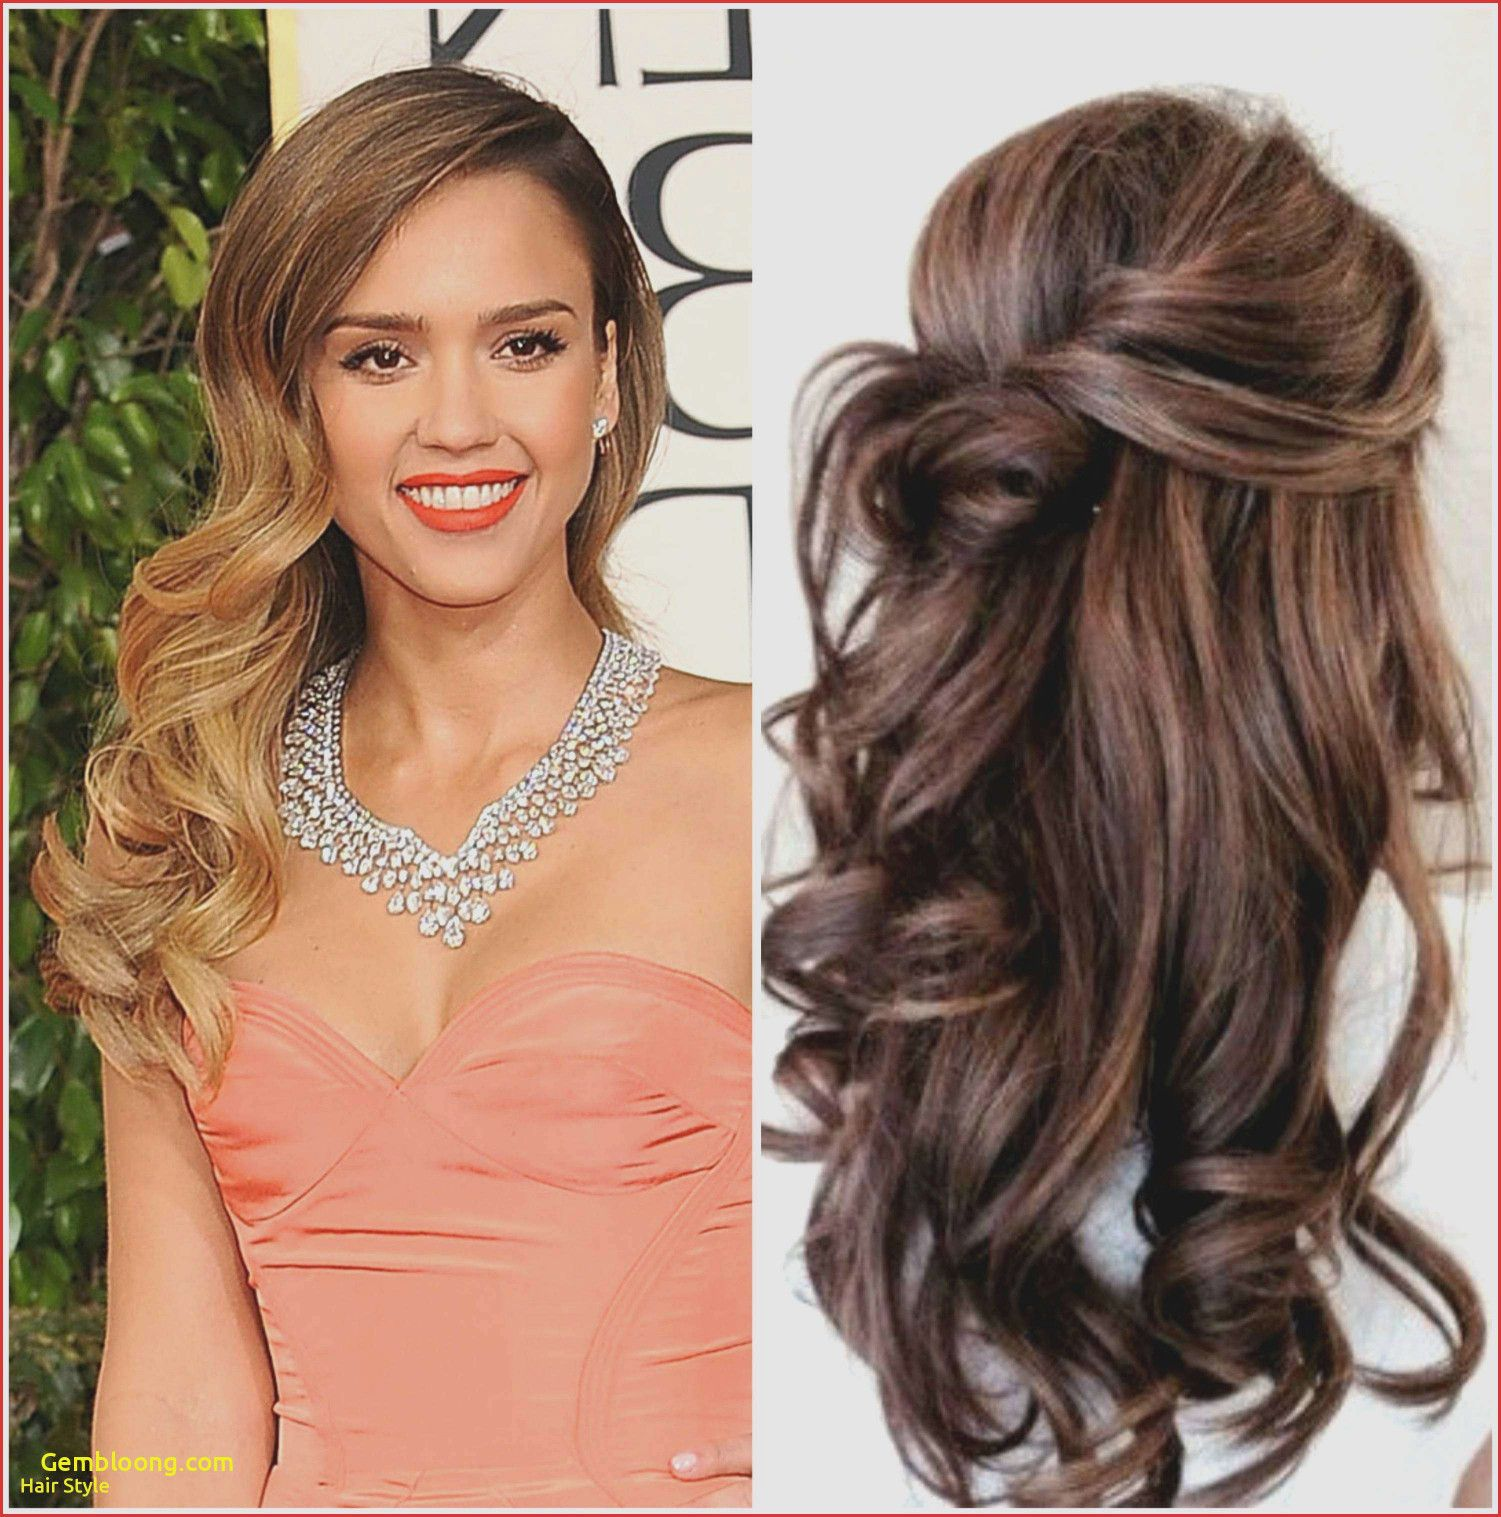 Ball Frisur Lange Haare Selber Machen   Medium hair styles, Long ...